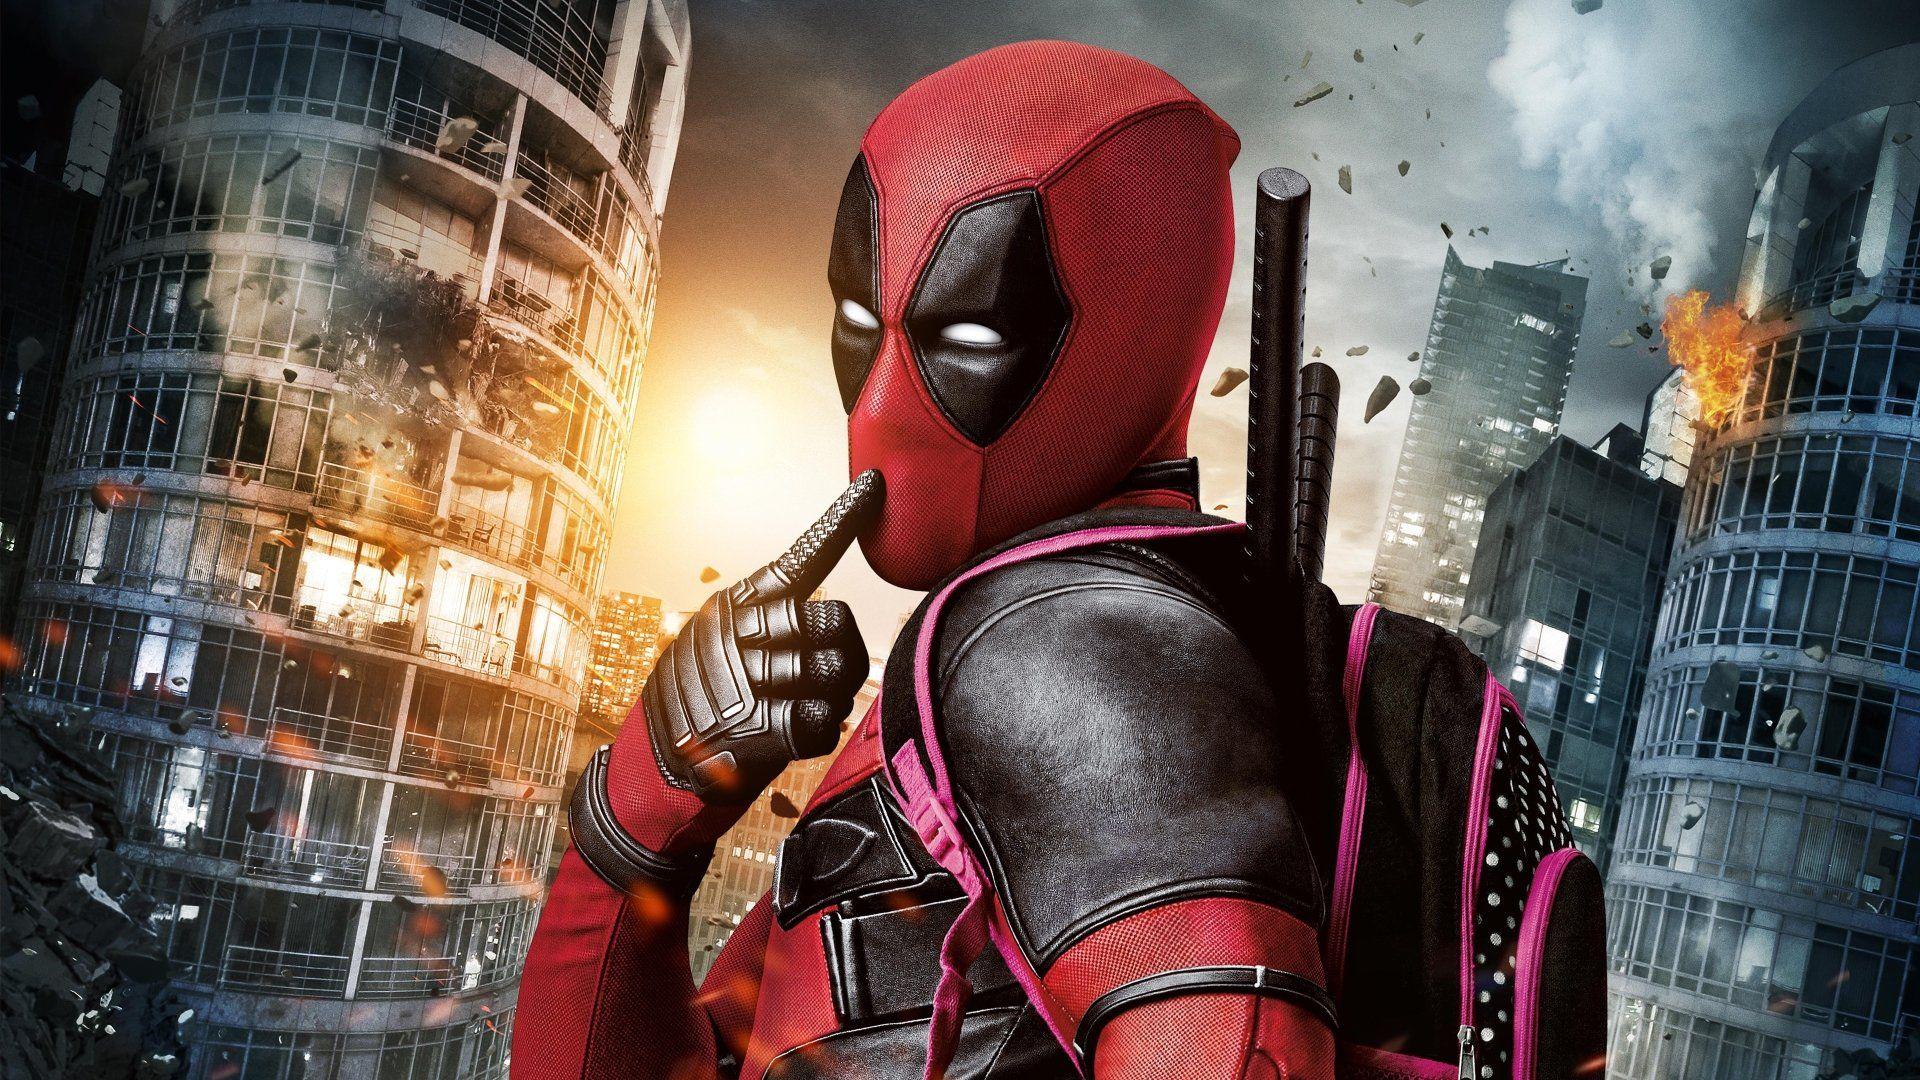 Fondos De Pantalla Hd Para Celular Marvel Deadpool